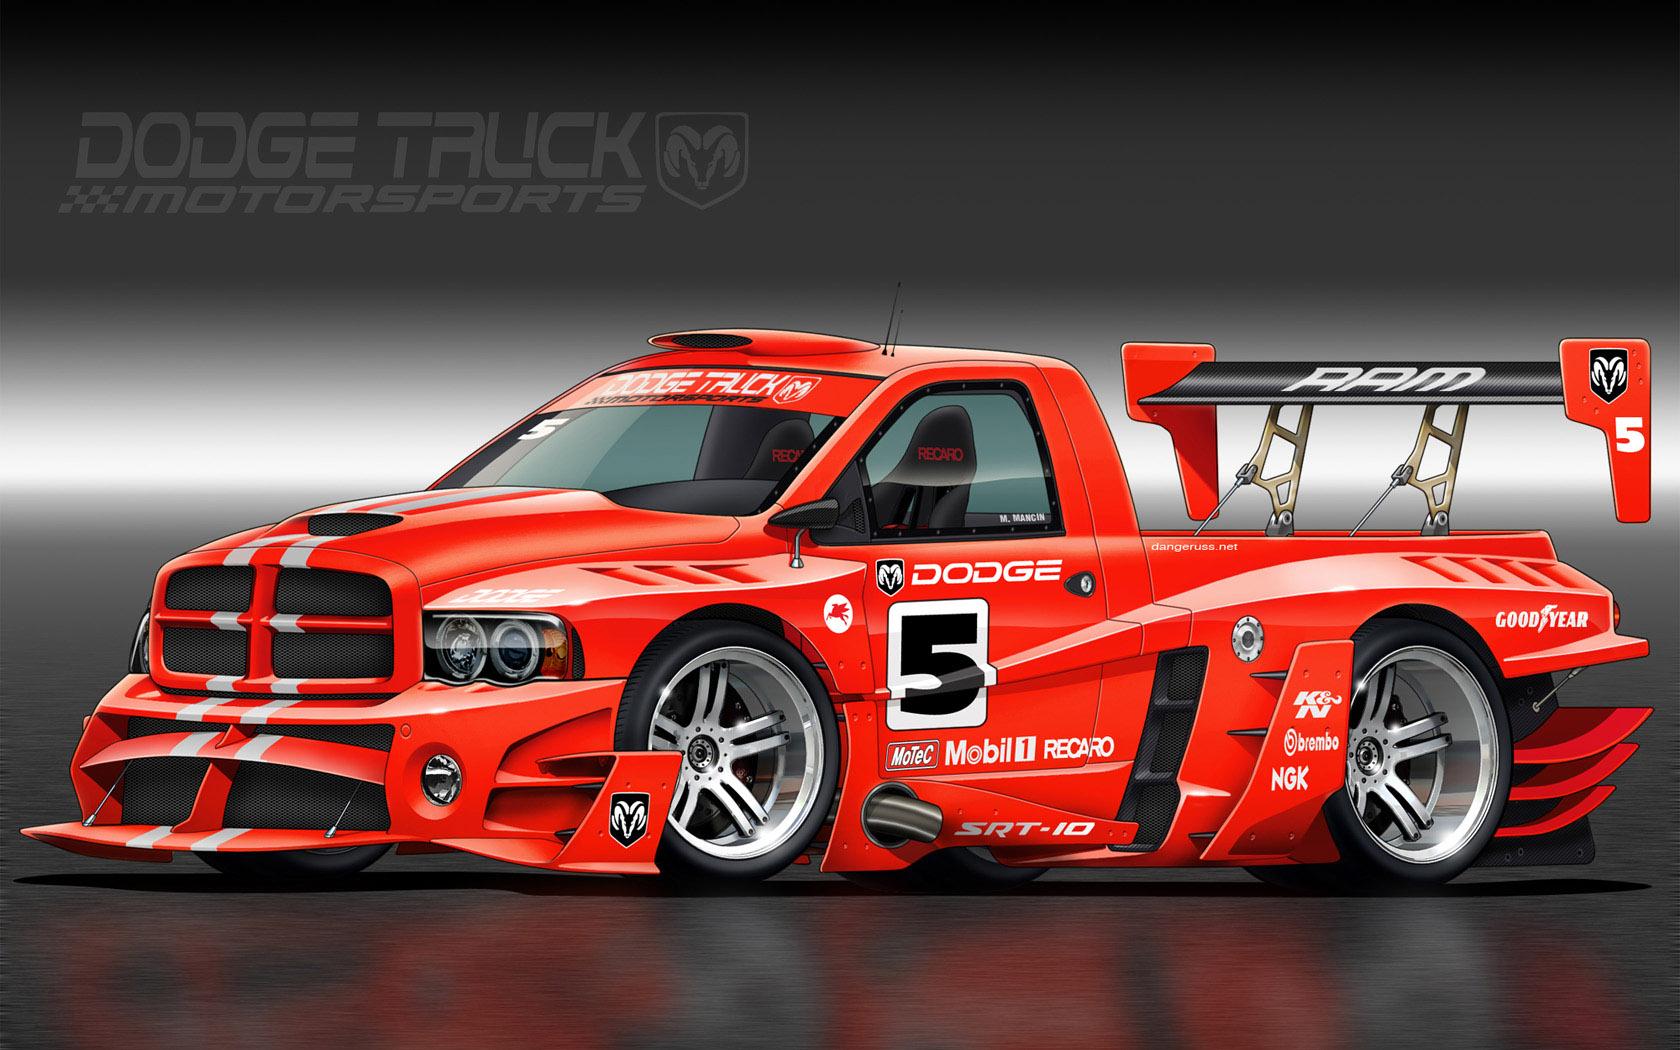 16801050 Dodge Truck HFS Edition Wallpaper 1680x1050